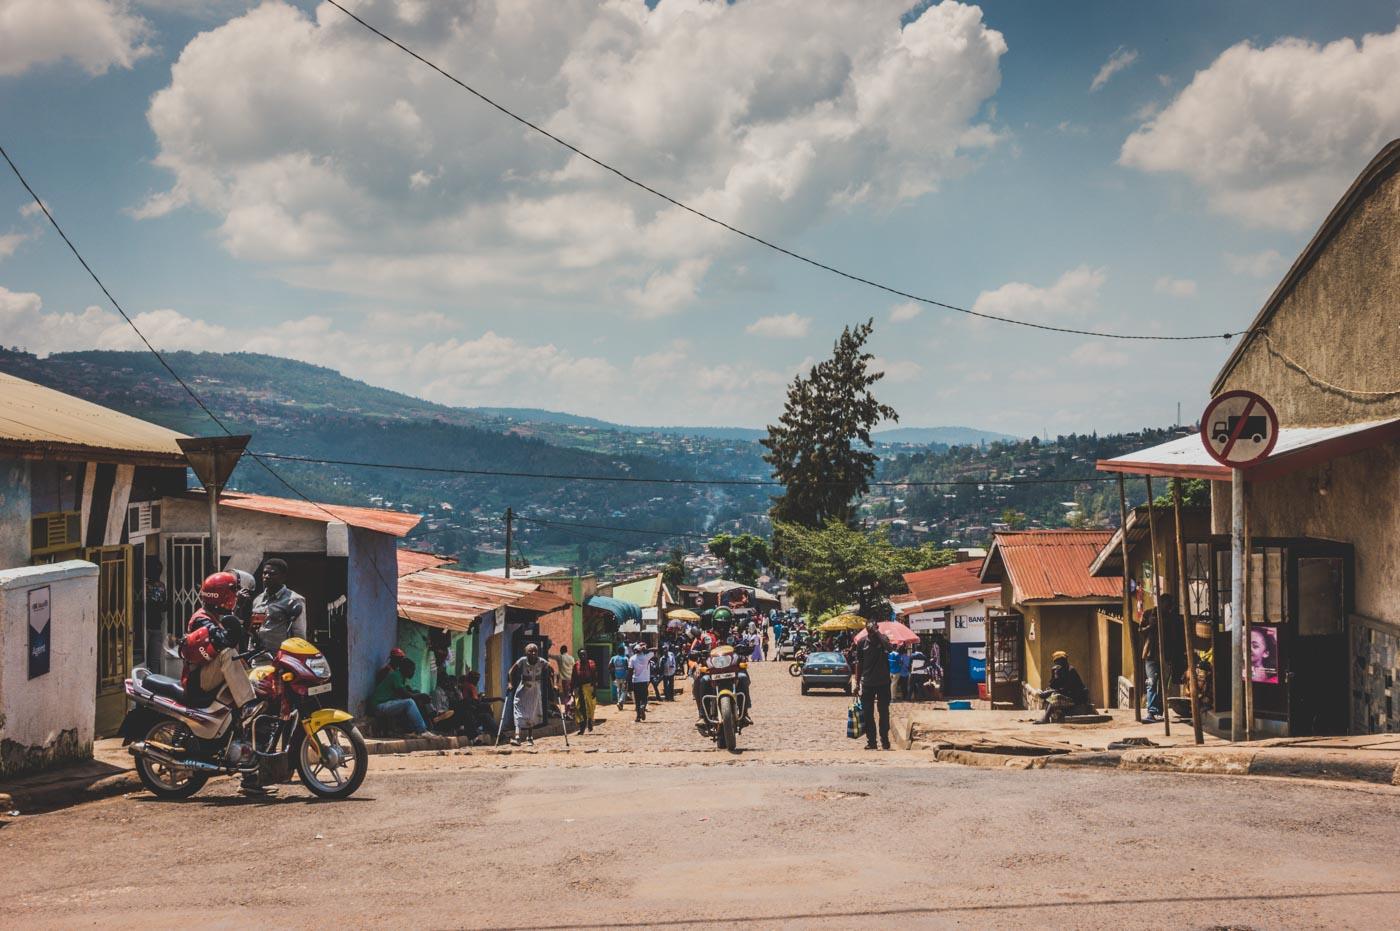 Traveling to Rwanda: Busy street in Kigali